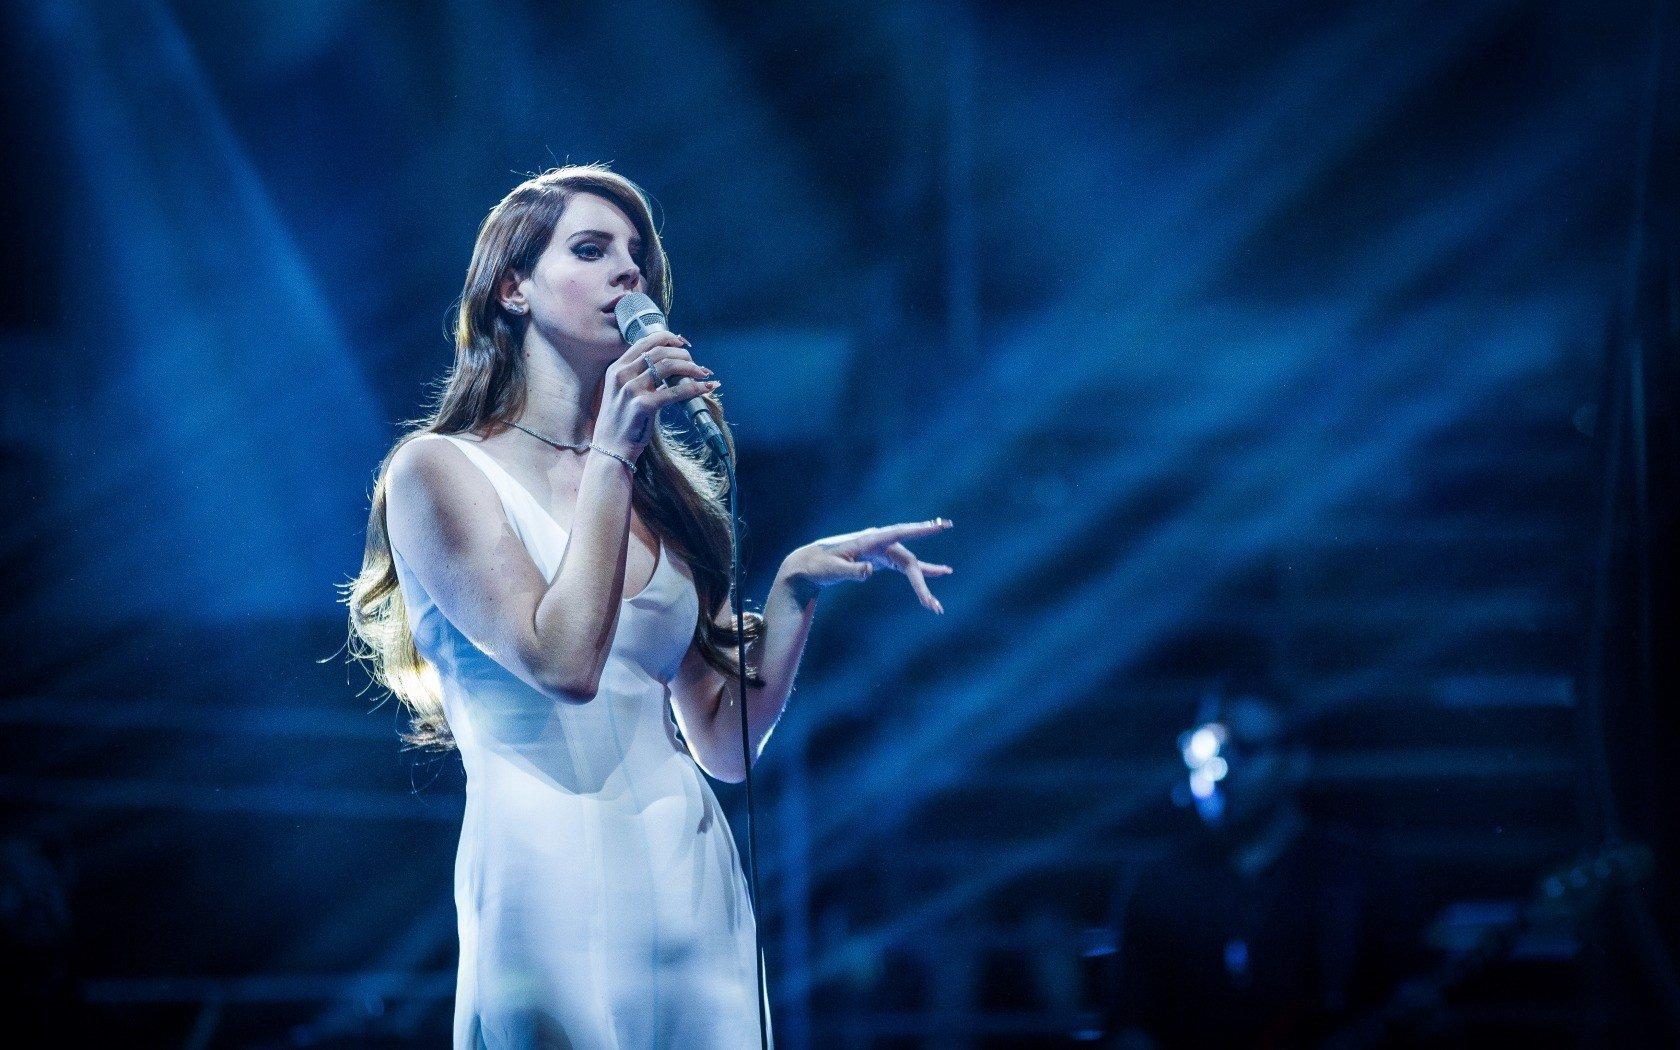 Lana Del Rey, Singer HD Wallpapers / Desktop and Mobile ...